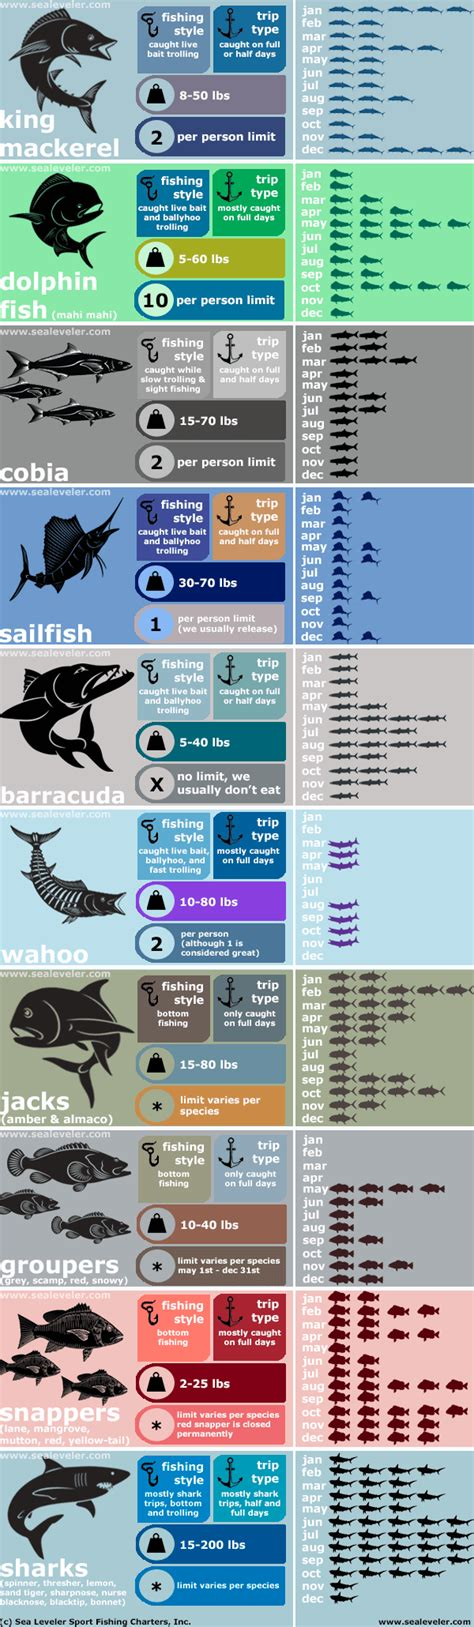 fish month fishing infographic florida caught keys sport charters saltwater sea leveler